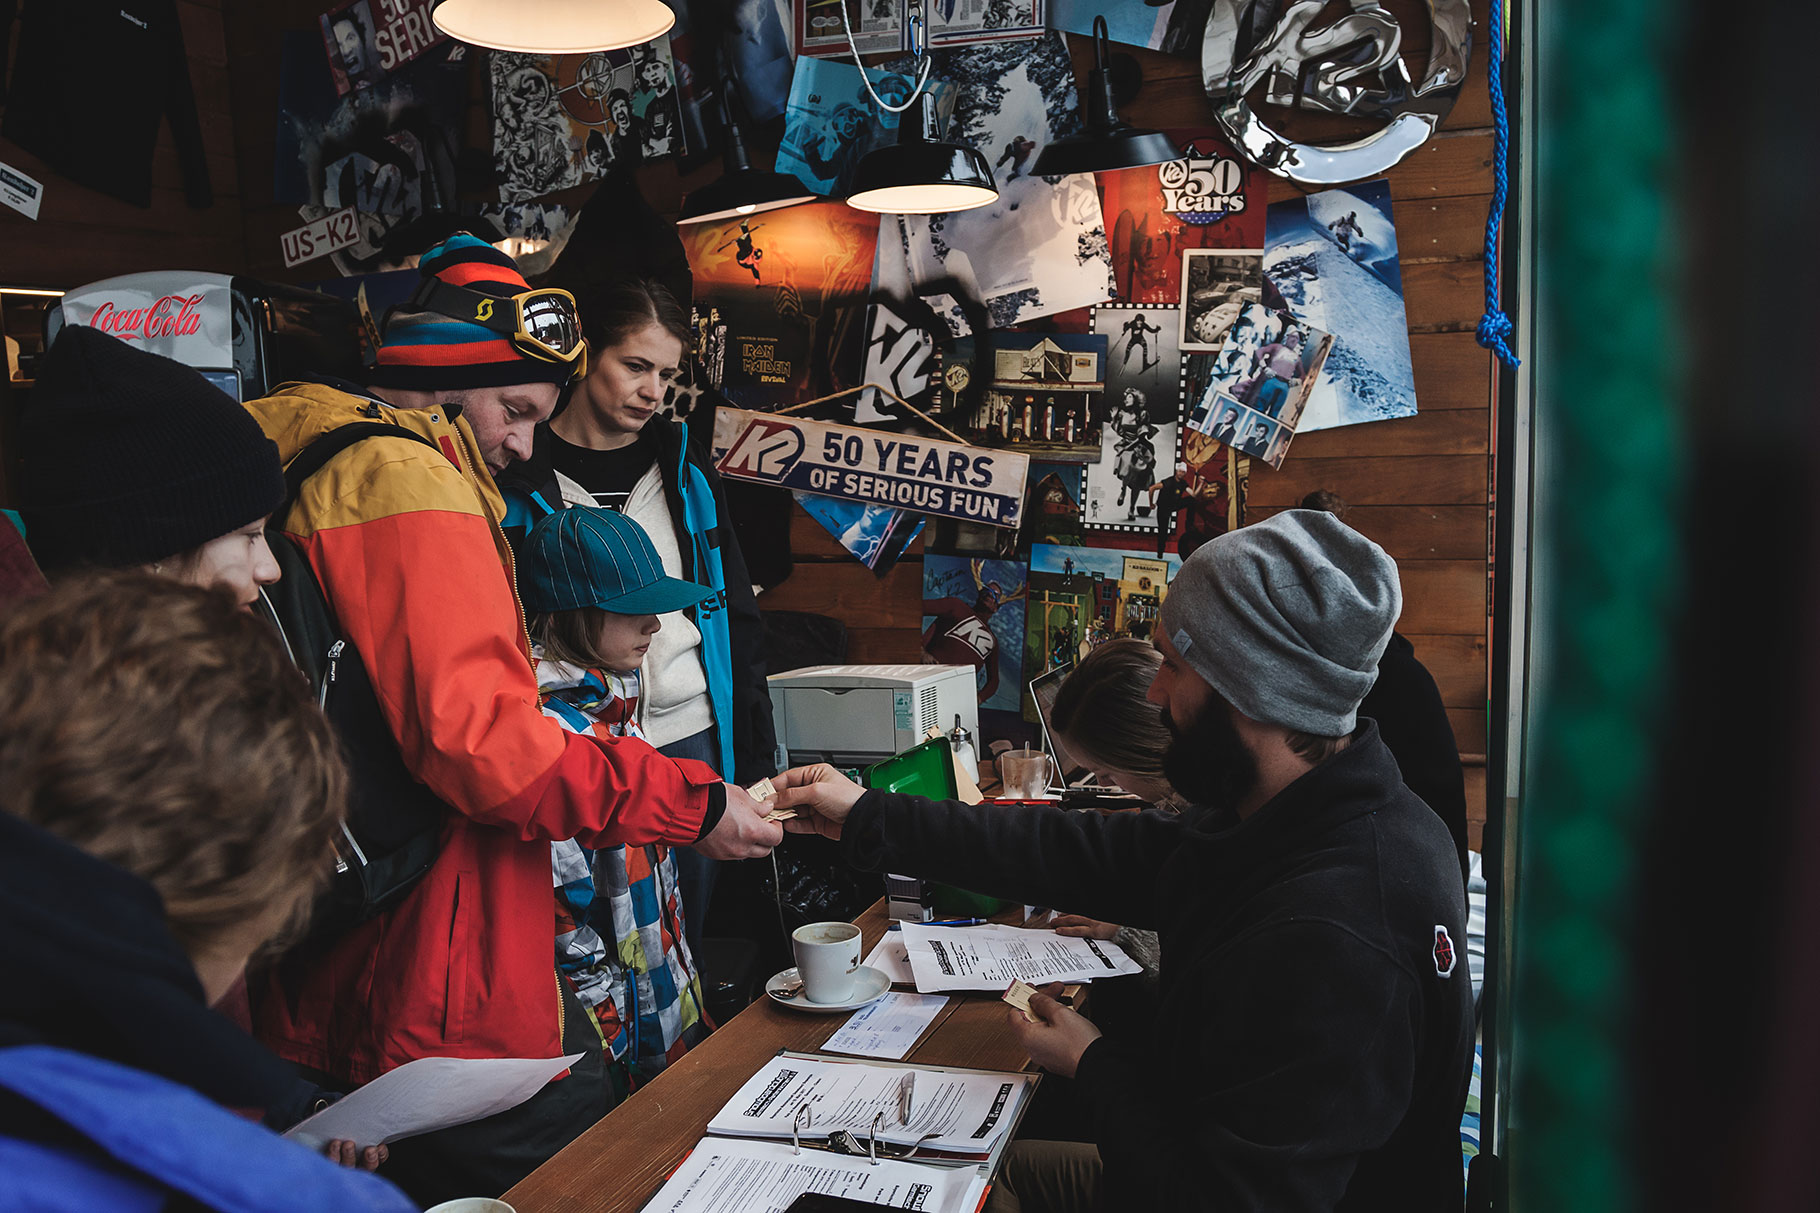 Anmeldung ausgefüllt? Dann ab auf den Kurs! | © Snowboardclub.me/Johannes Deuschl